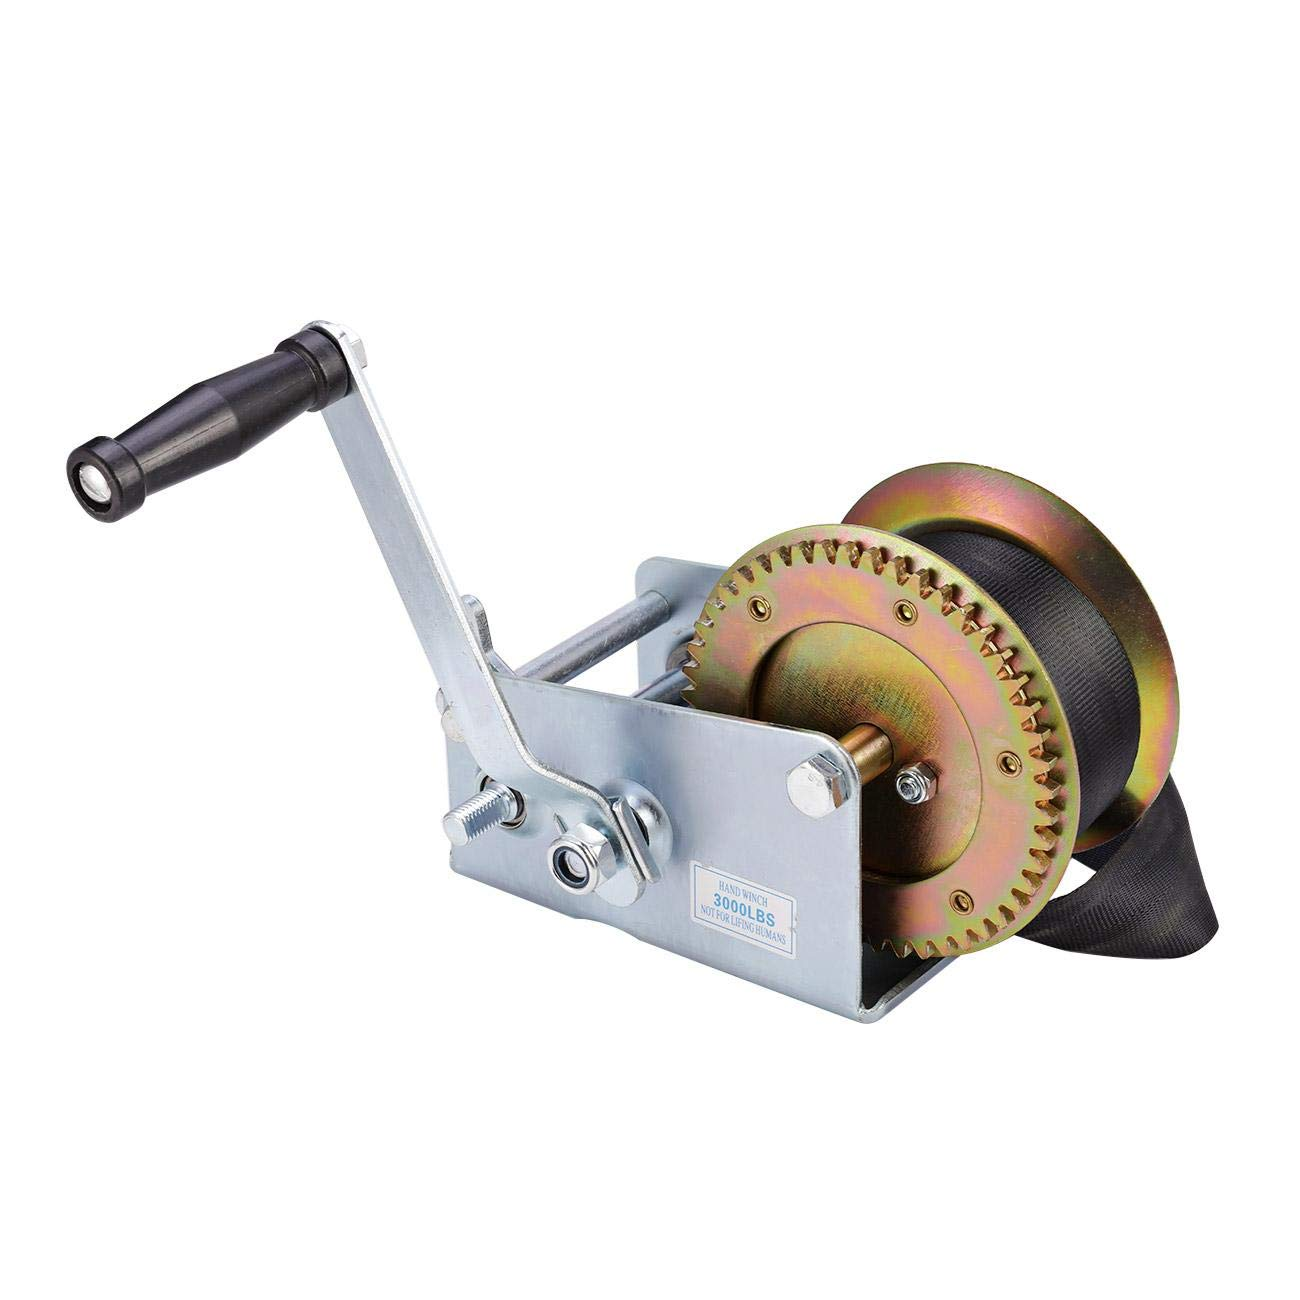 ALAVENTE 3200lbs Hand Winch Crank Cable, Heavy Duty Gear Winch for Trailer, Boat or ATV (Steel)